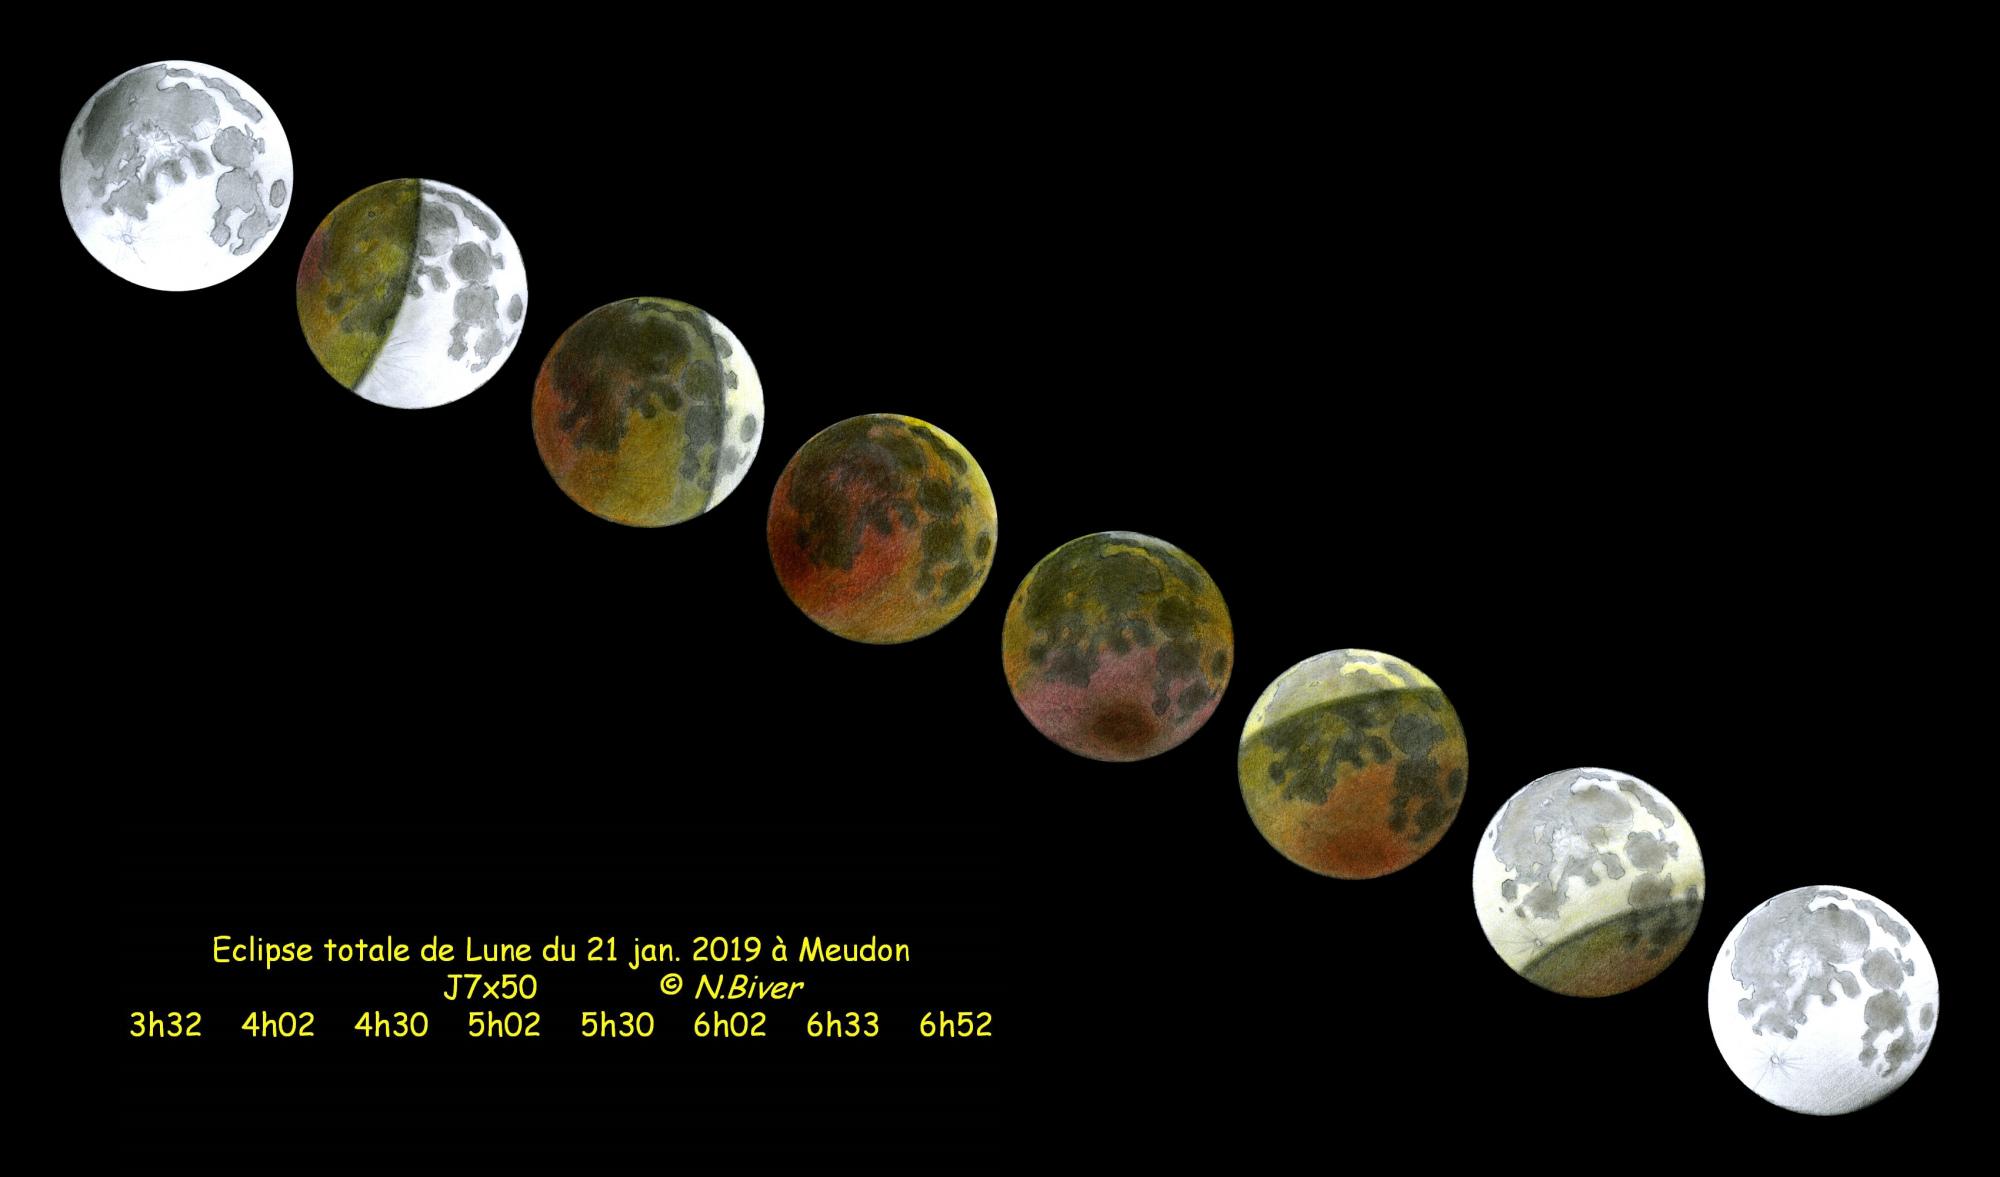 eclipse-lune210119-3h32-6h52-j7x50leg.thumb.jpg.b9e4b3acd886fd559a94dbc680aaed97.jpg